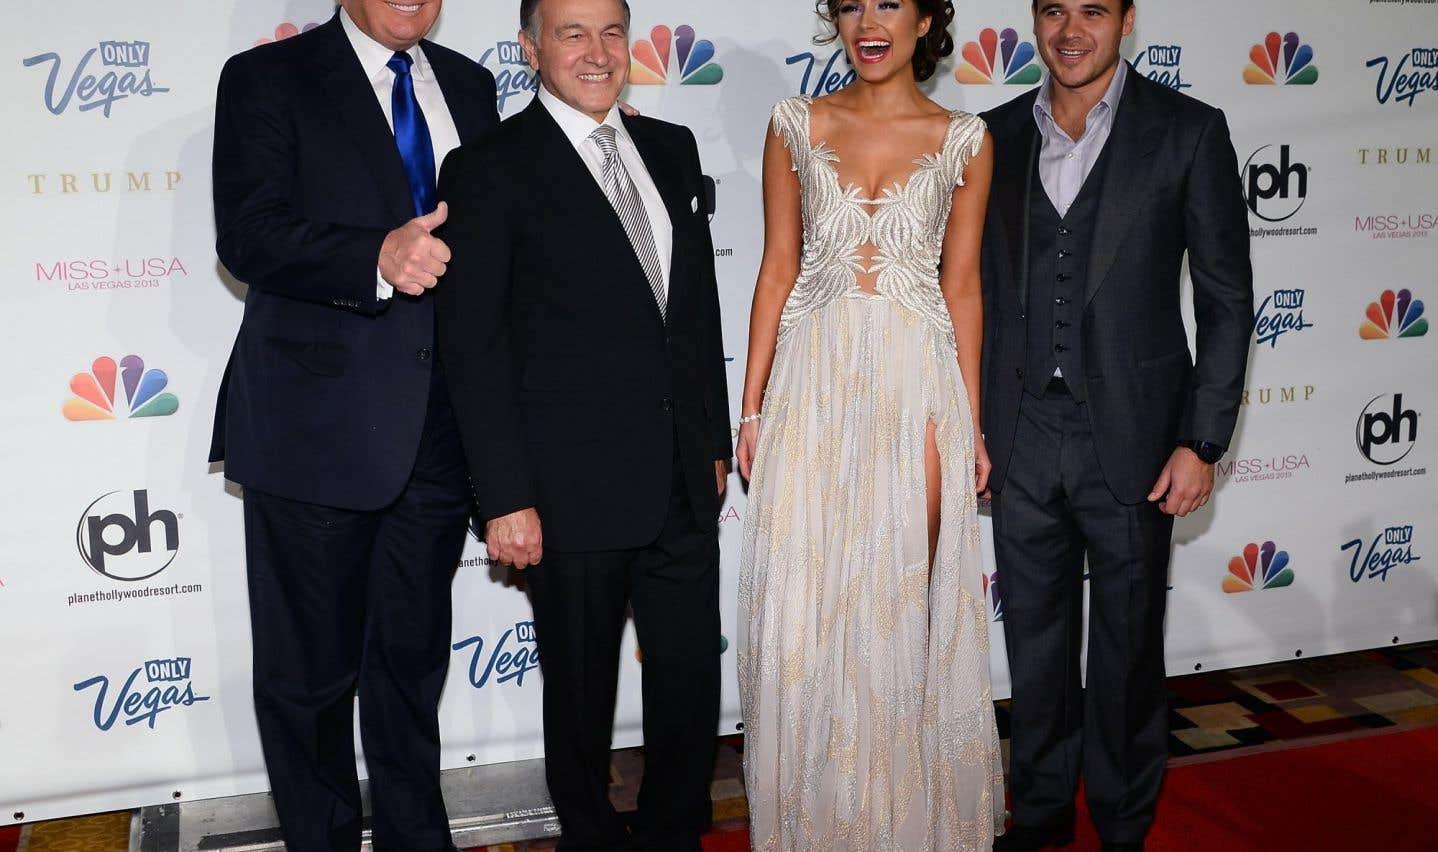 Donald Trump, Aras Agalarov, Olivia Culpo (Miss USA 2012) et Emin Agalarov au concours de beauté Miss USA 2013 à Las Vegas le 16 juin 2013.